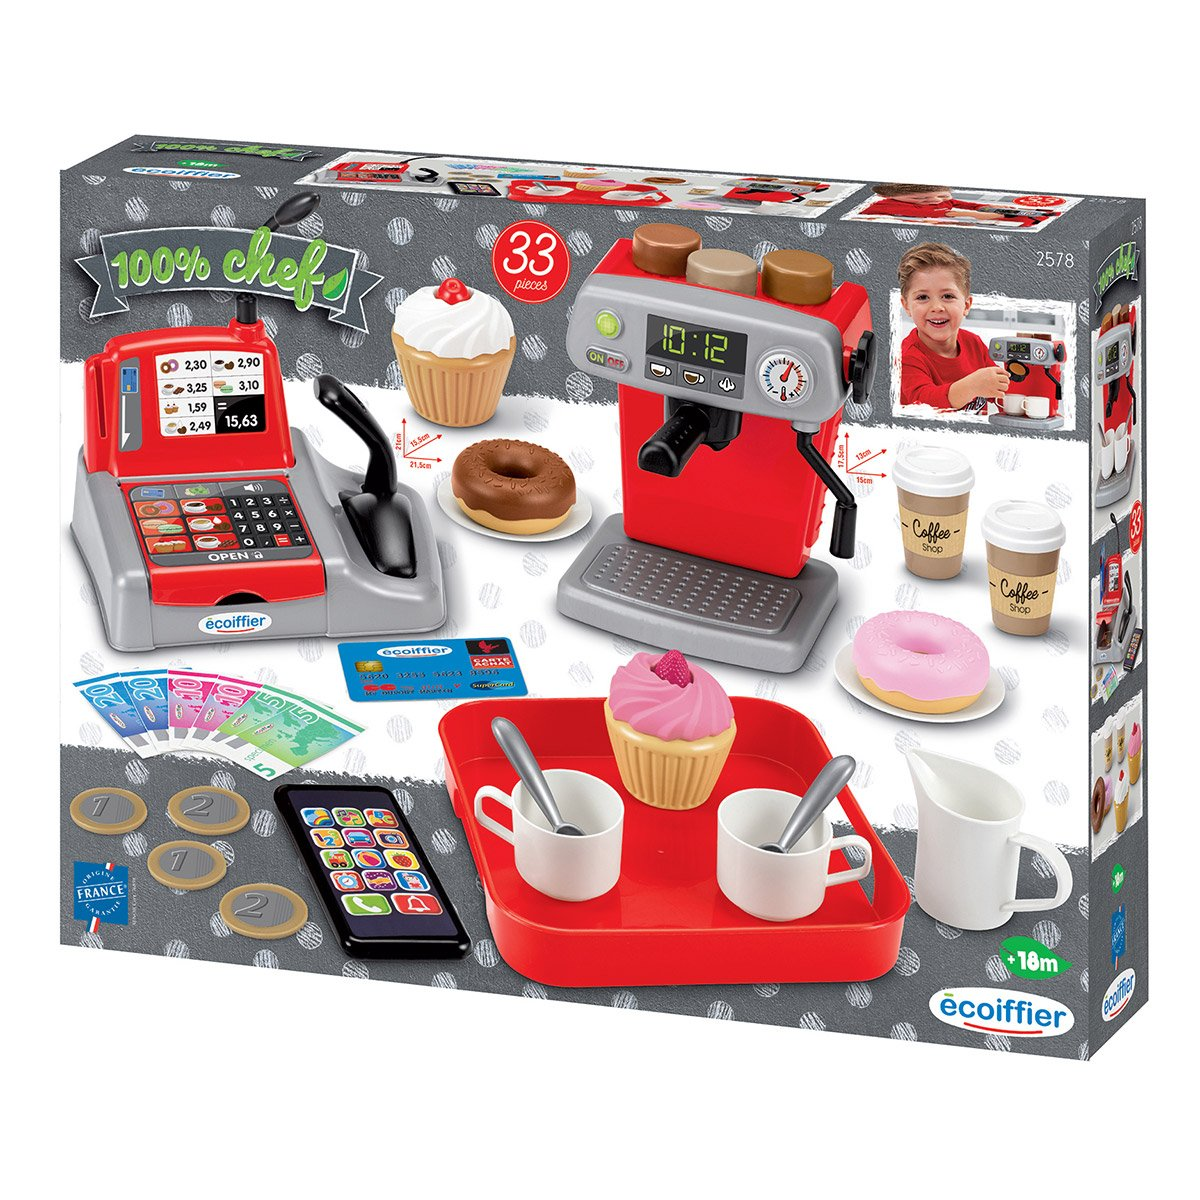 SET COFFEE SHOP 100% CHEF 2578